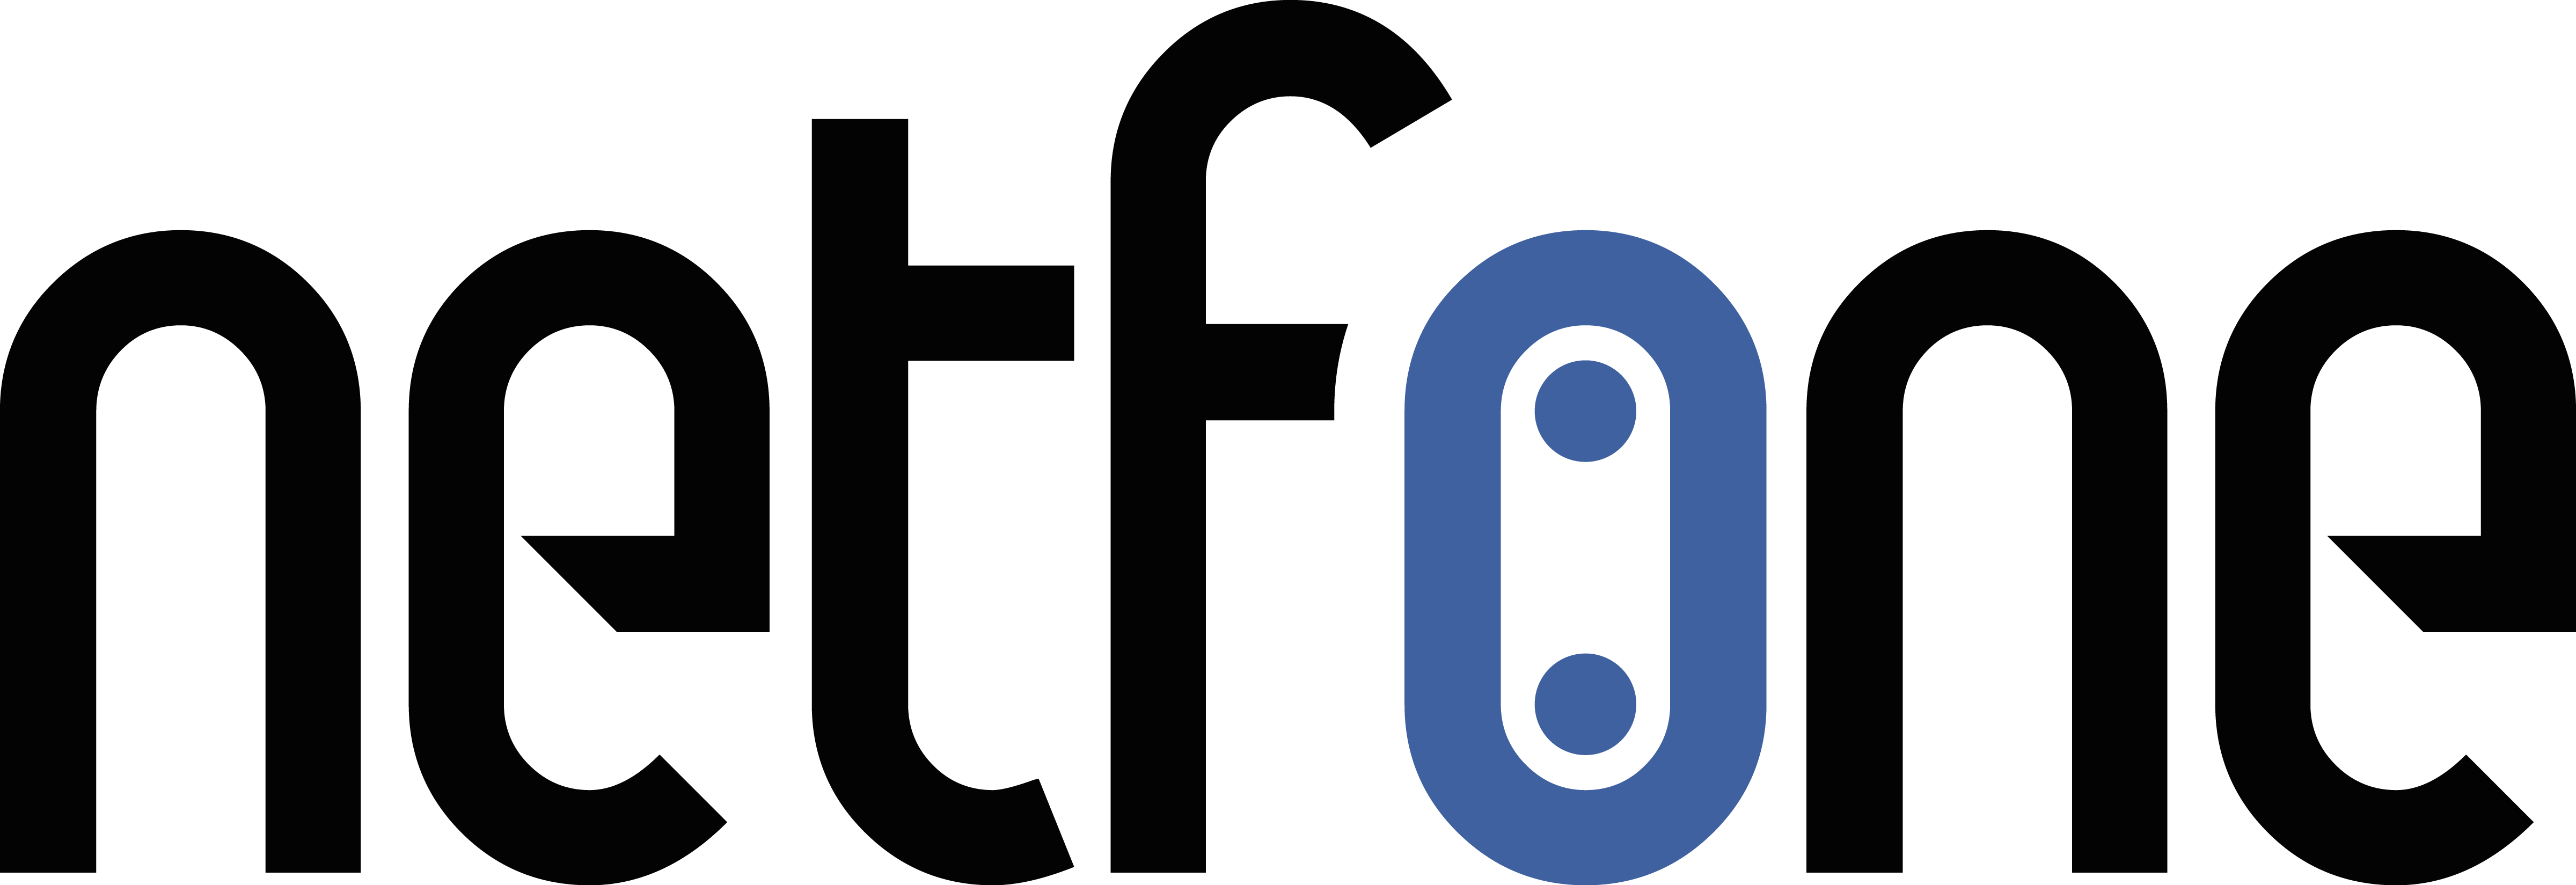 Netfone